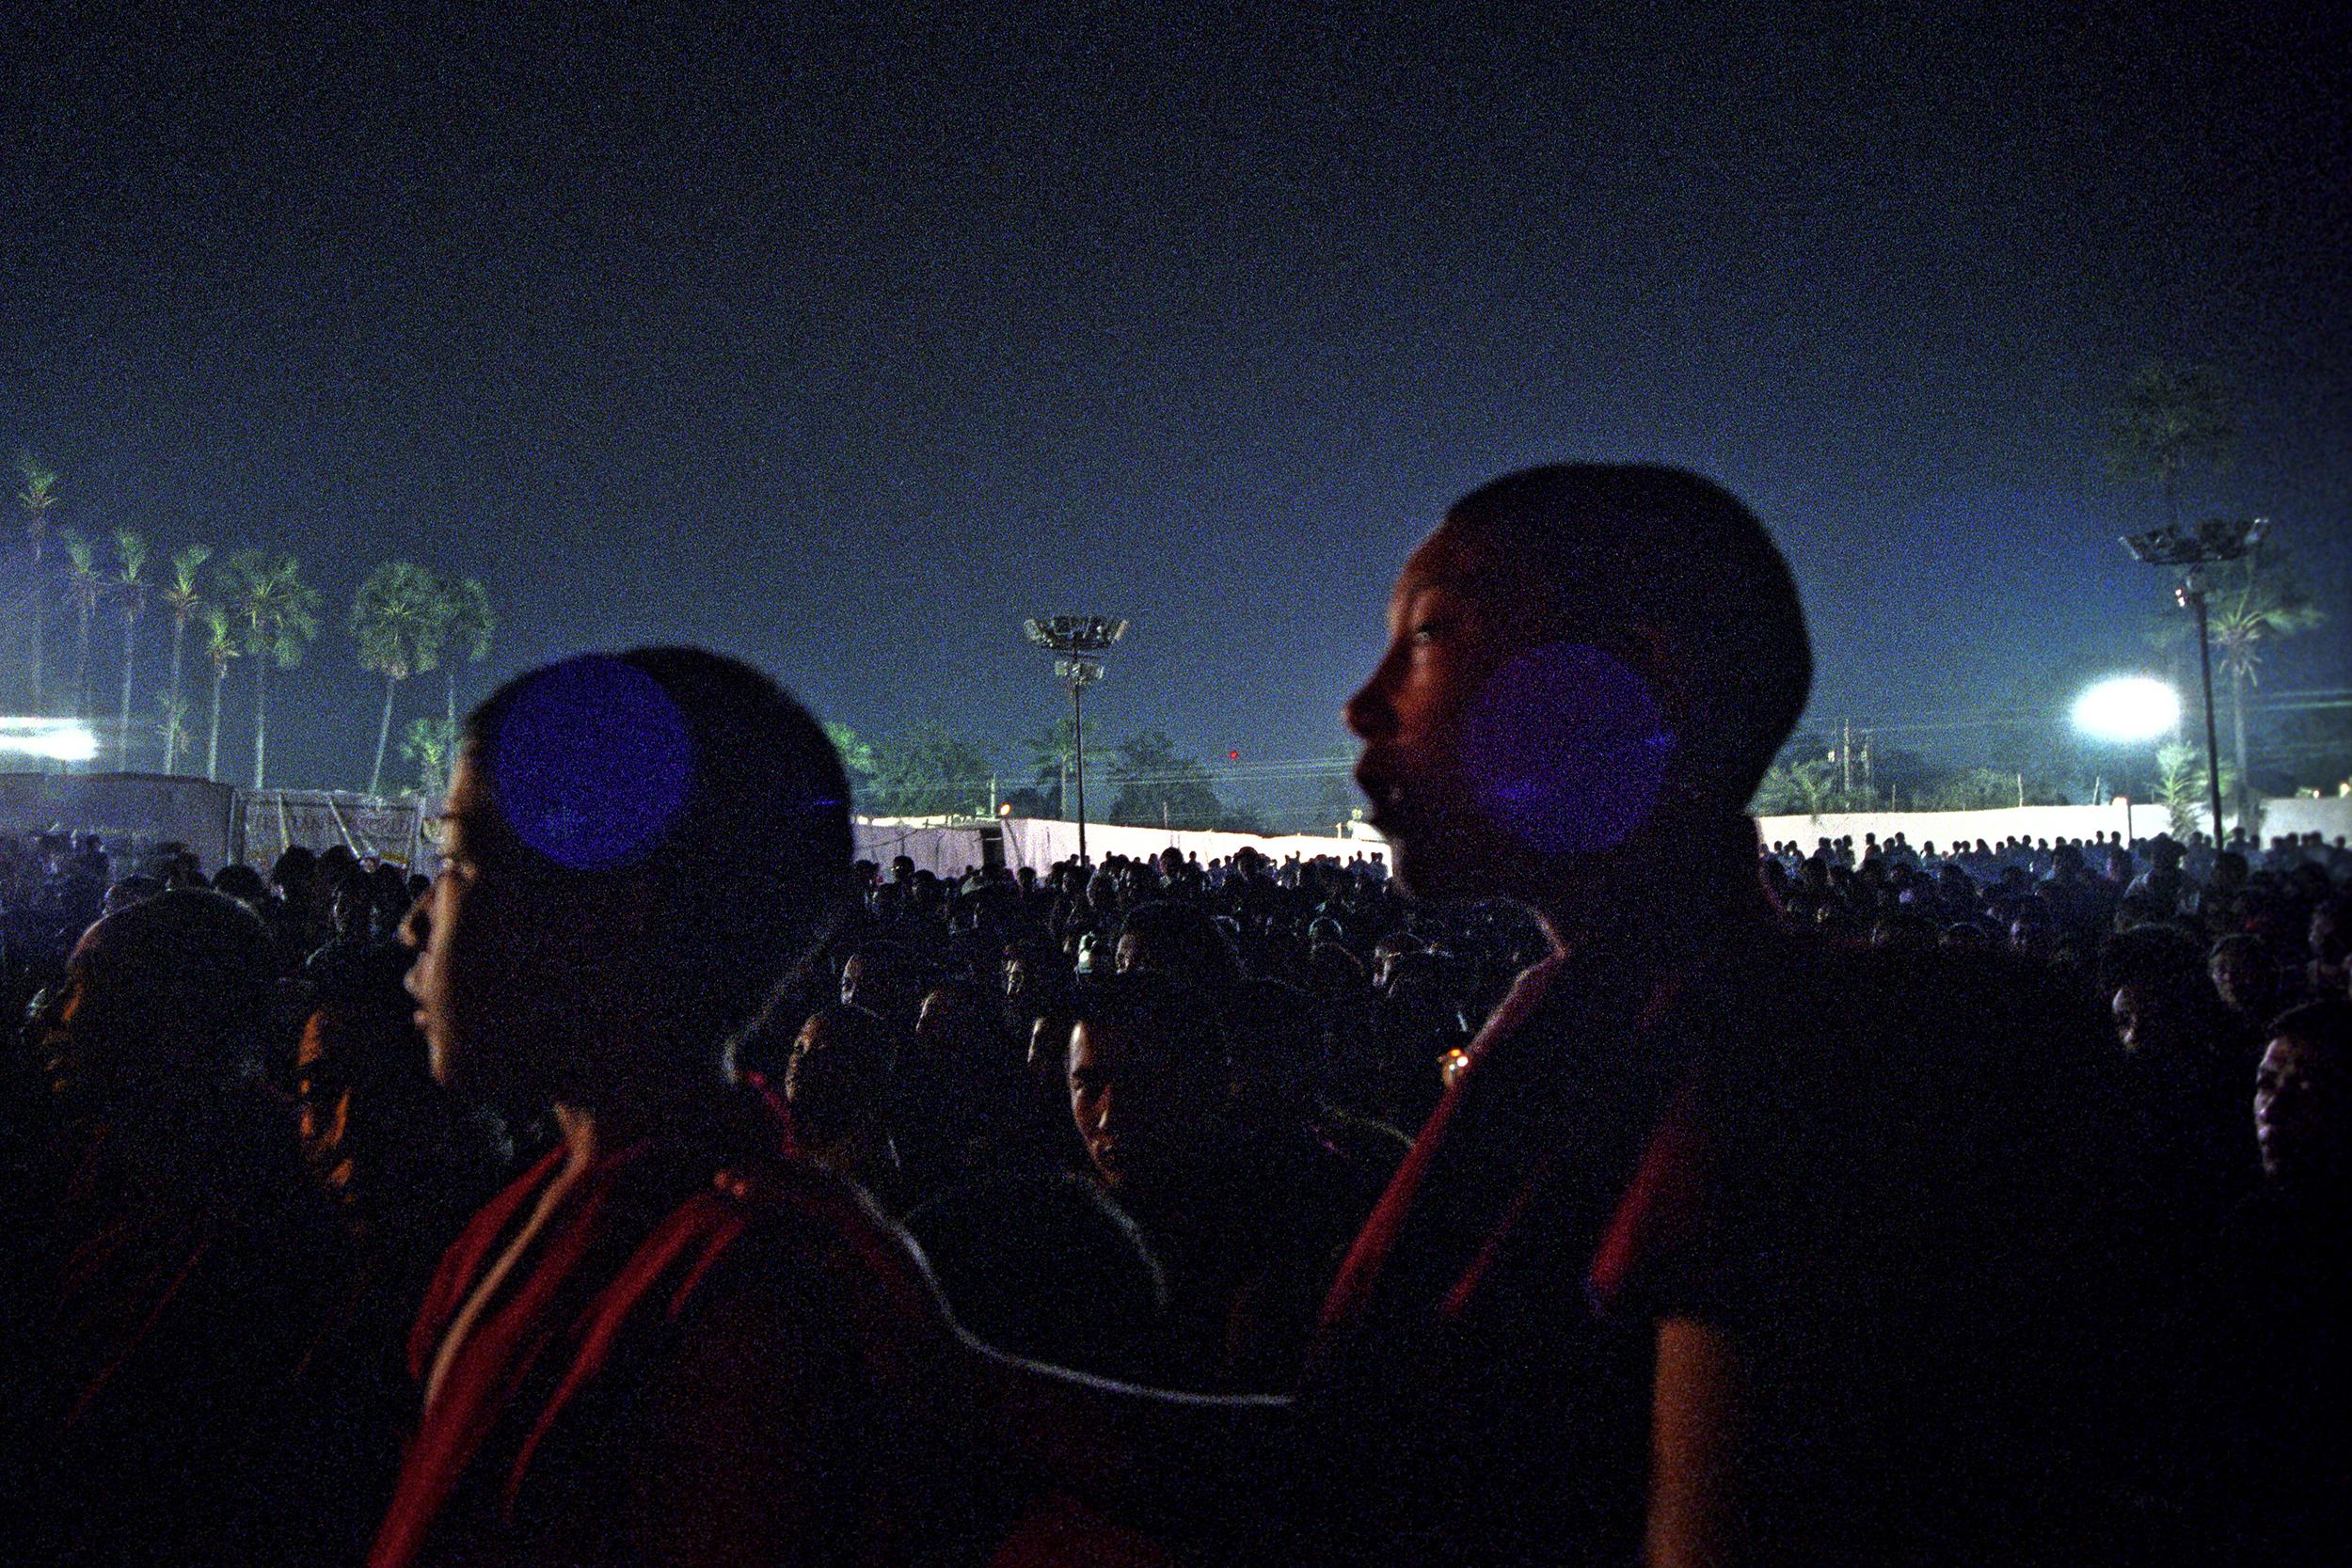 Web_amar_crowd in concert2.jpg